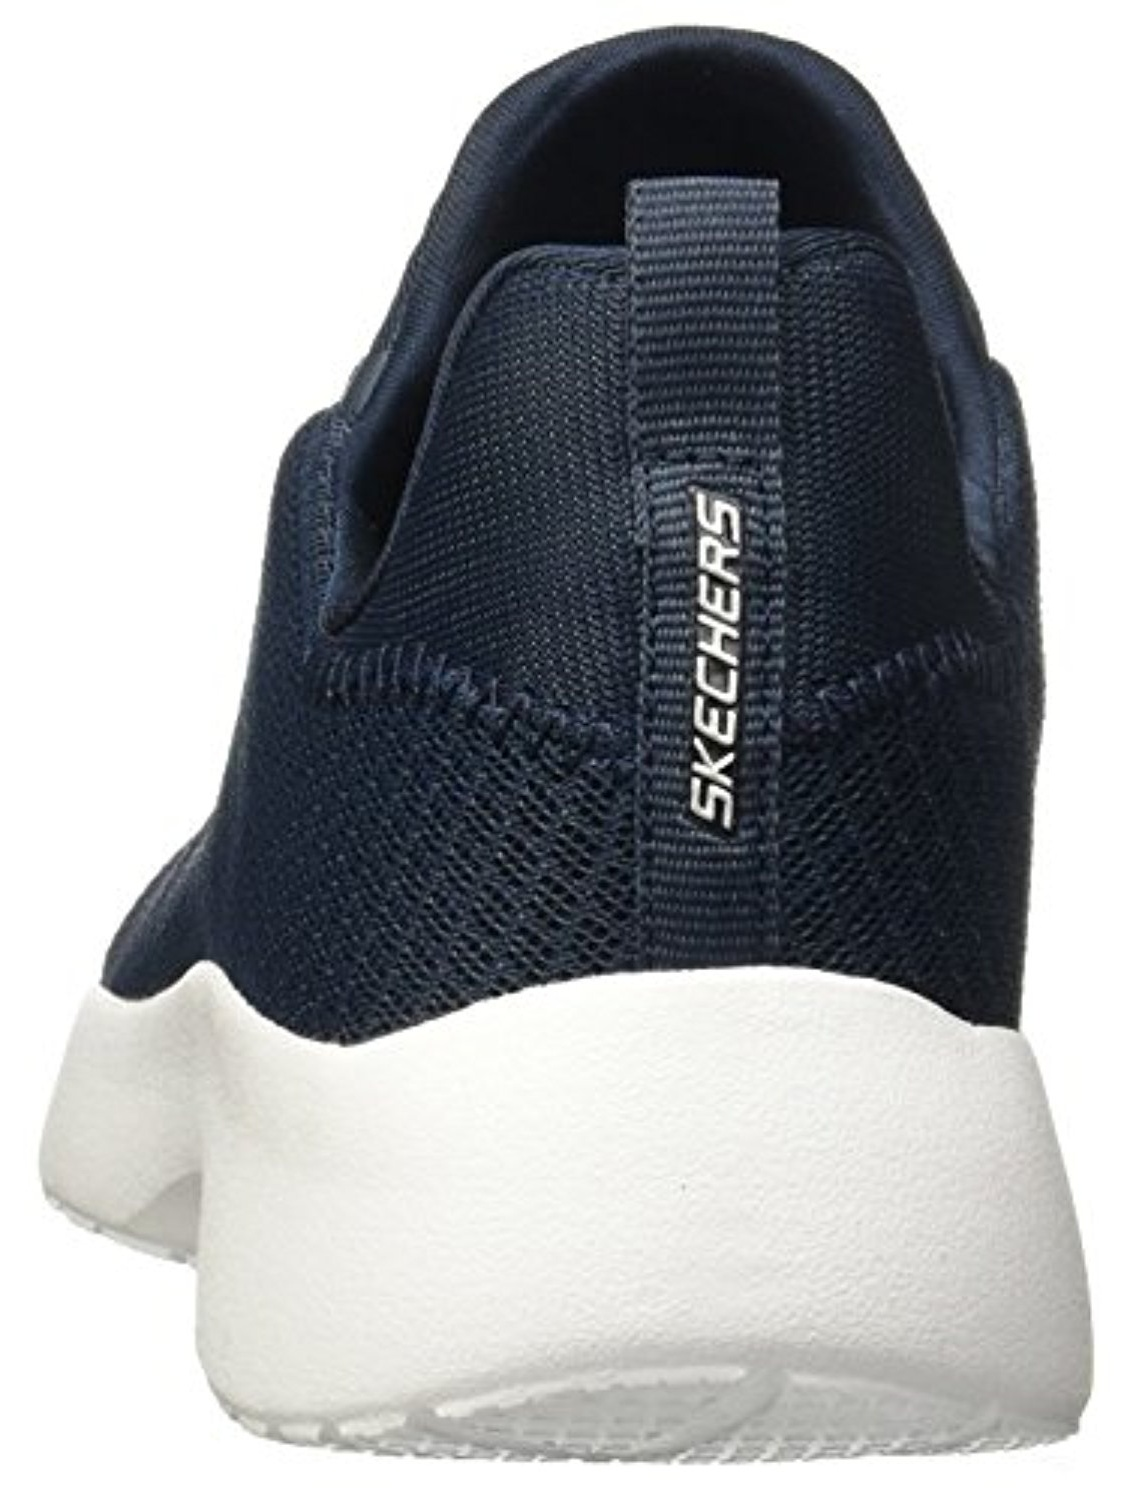 a7cdf01d2bc Skechers - 12119 Navy Skechers Shoes Memory Foam Women Slipon Sport Comfort  Soft Mesh Train 12119NVY - Walmart.com